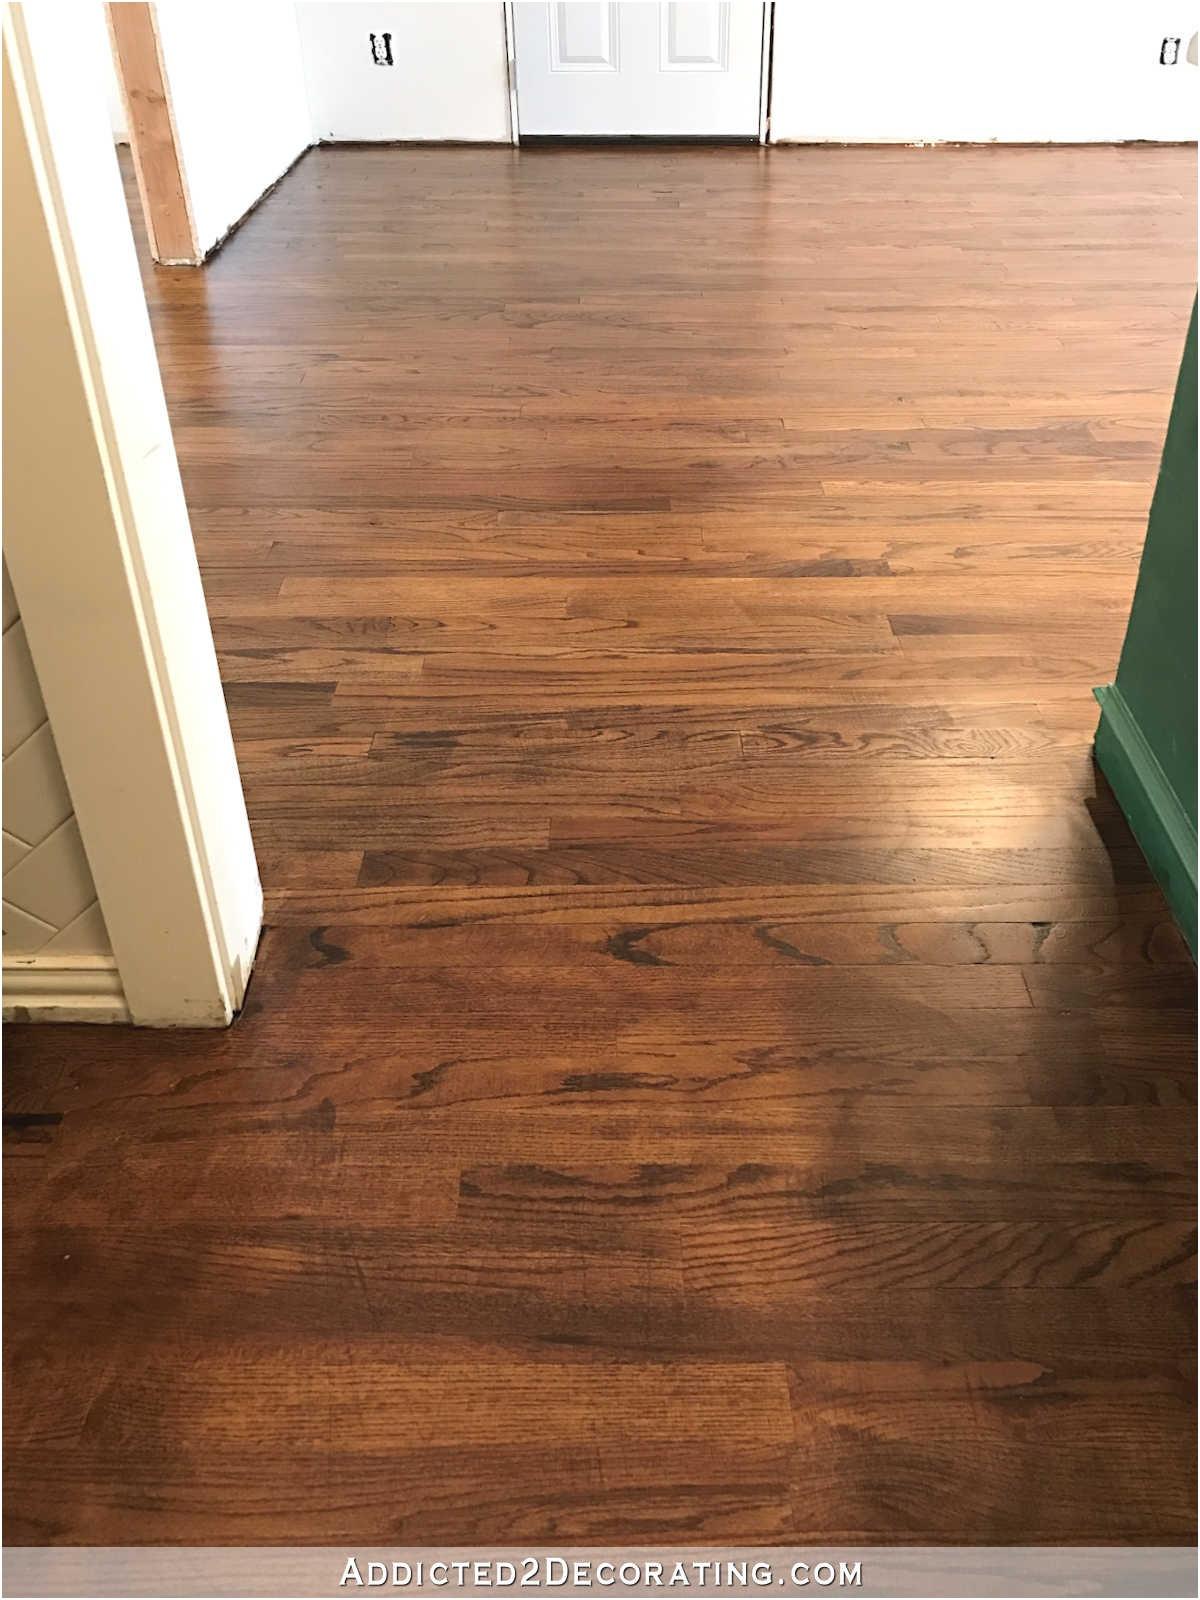 wholesale hardwood flooring st louis of hardwood flooring over ceramic tile stock 3 4 x 4 3 4 solid golden with regard to hardwood flooring over ceramic tile stock engineered hardwood vs hardwood cost best laminate for kitchen of